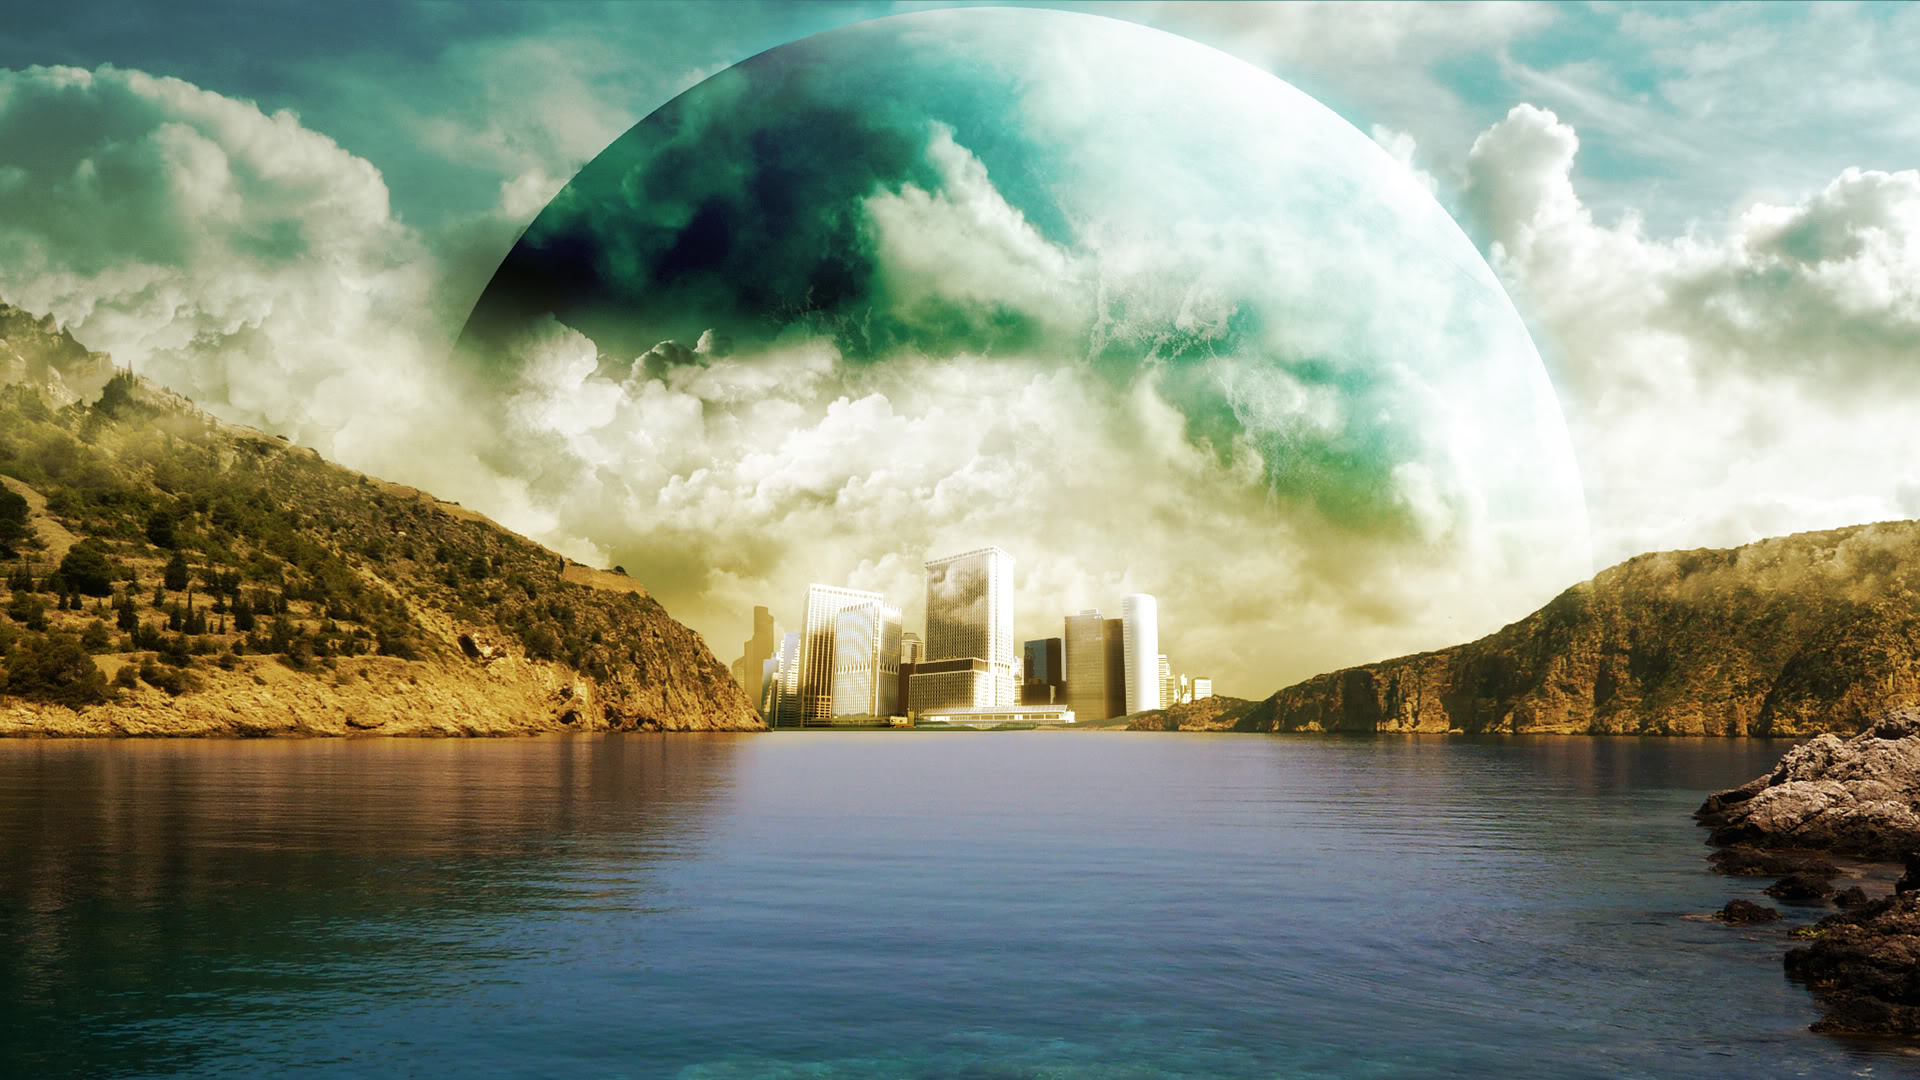 High Resolution Awesome Fantasy Sci Fi Landscape Wallpaper HD 1 1920x1080